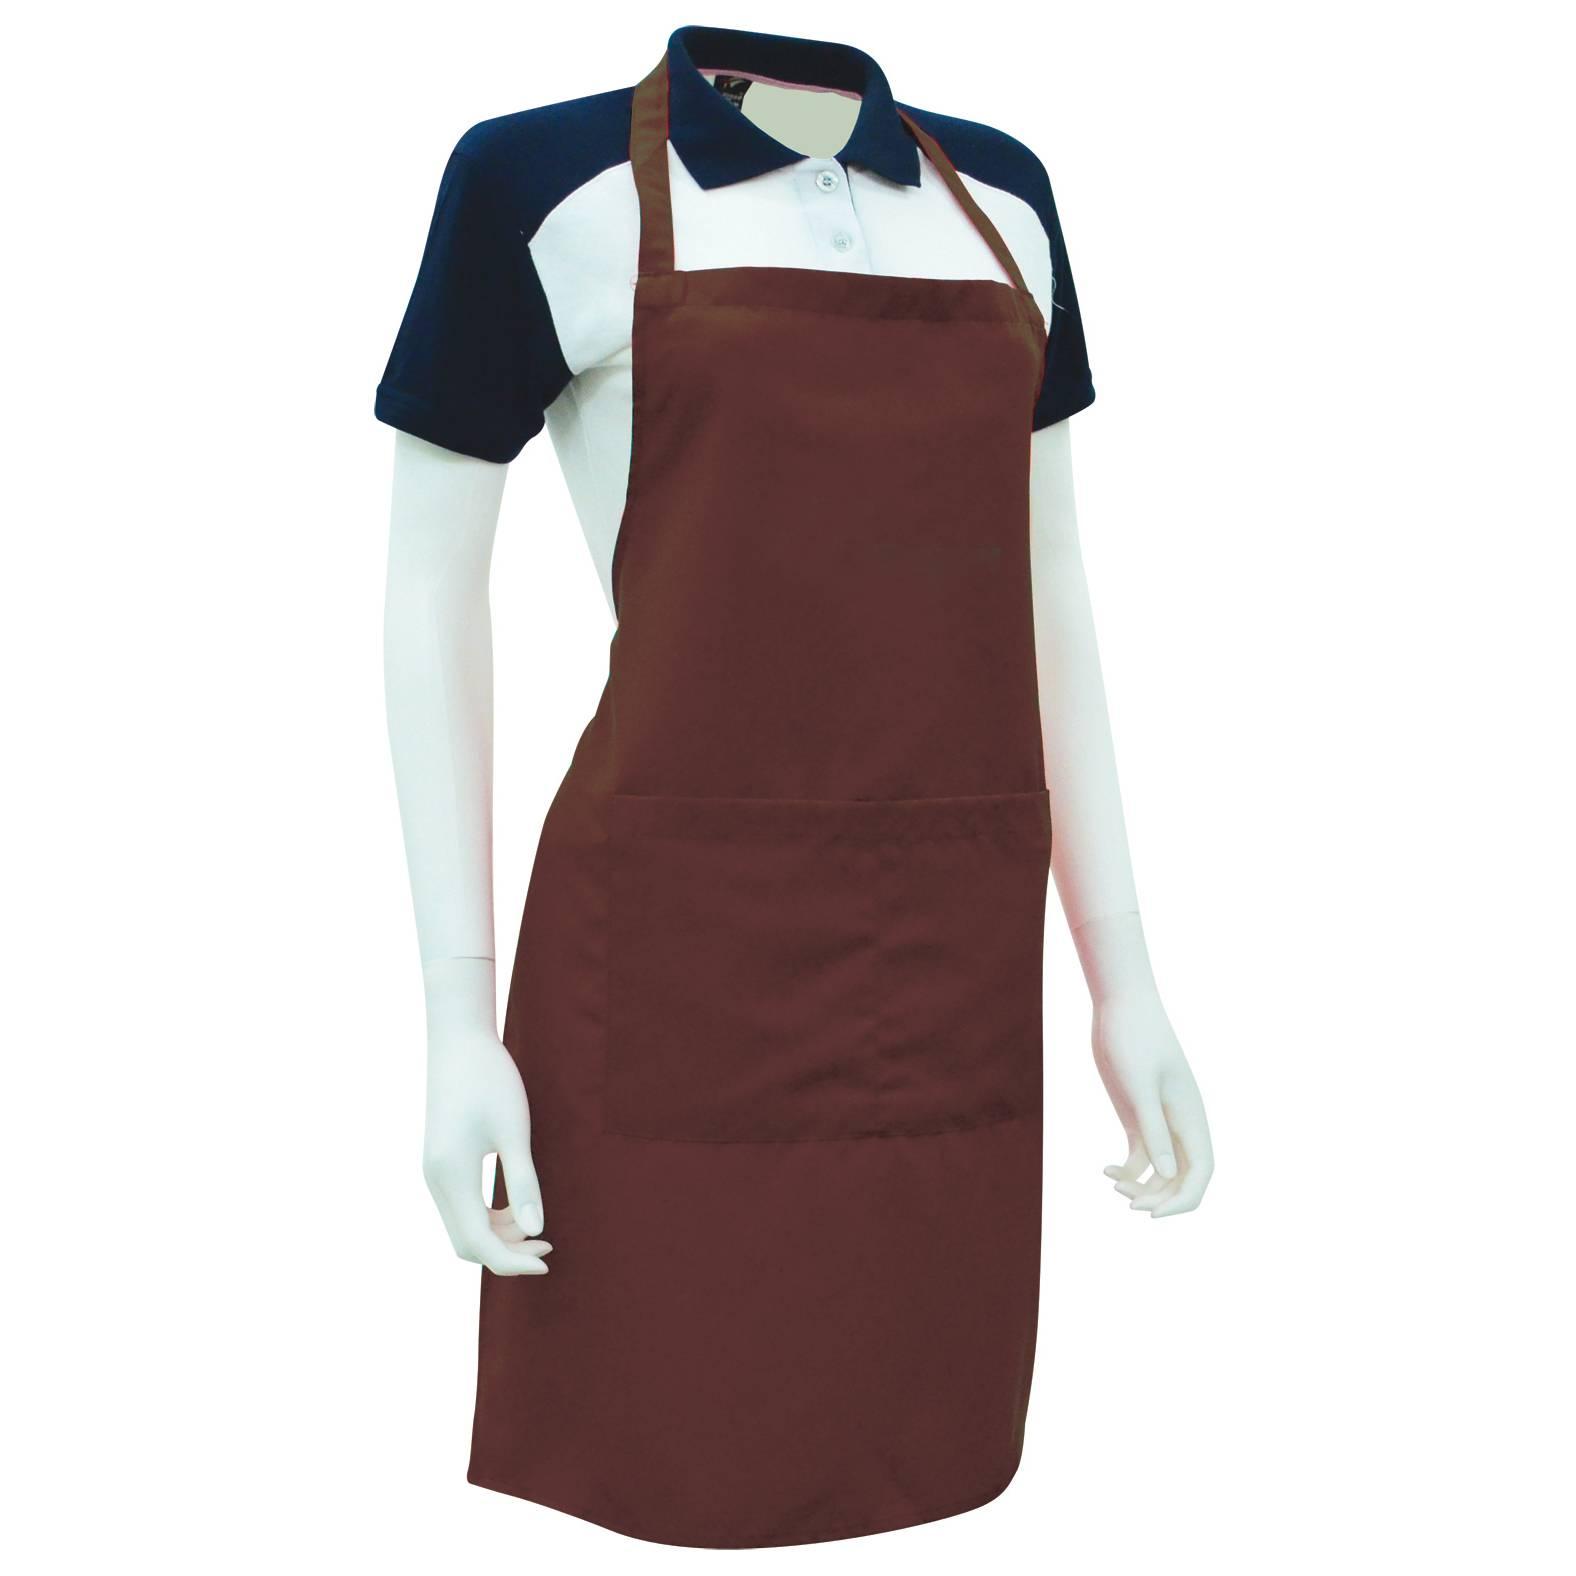 White apron malaysia - Full Body Apron Af00